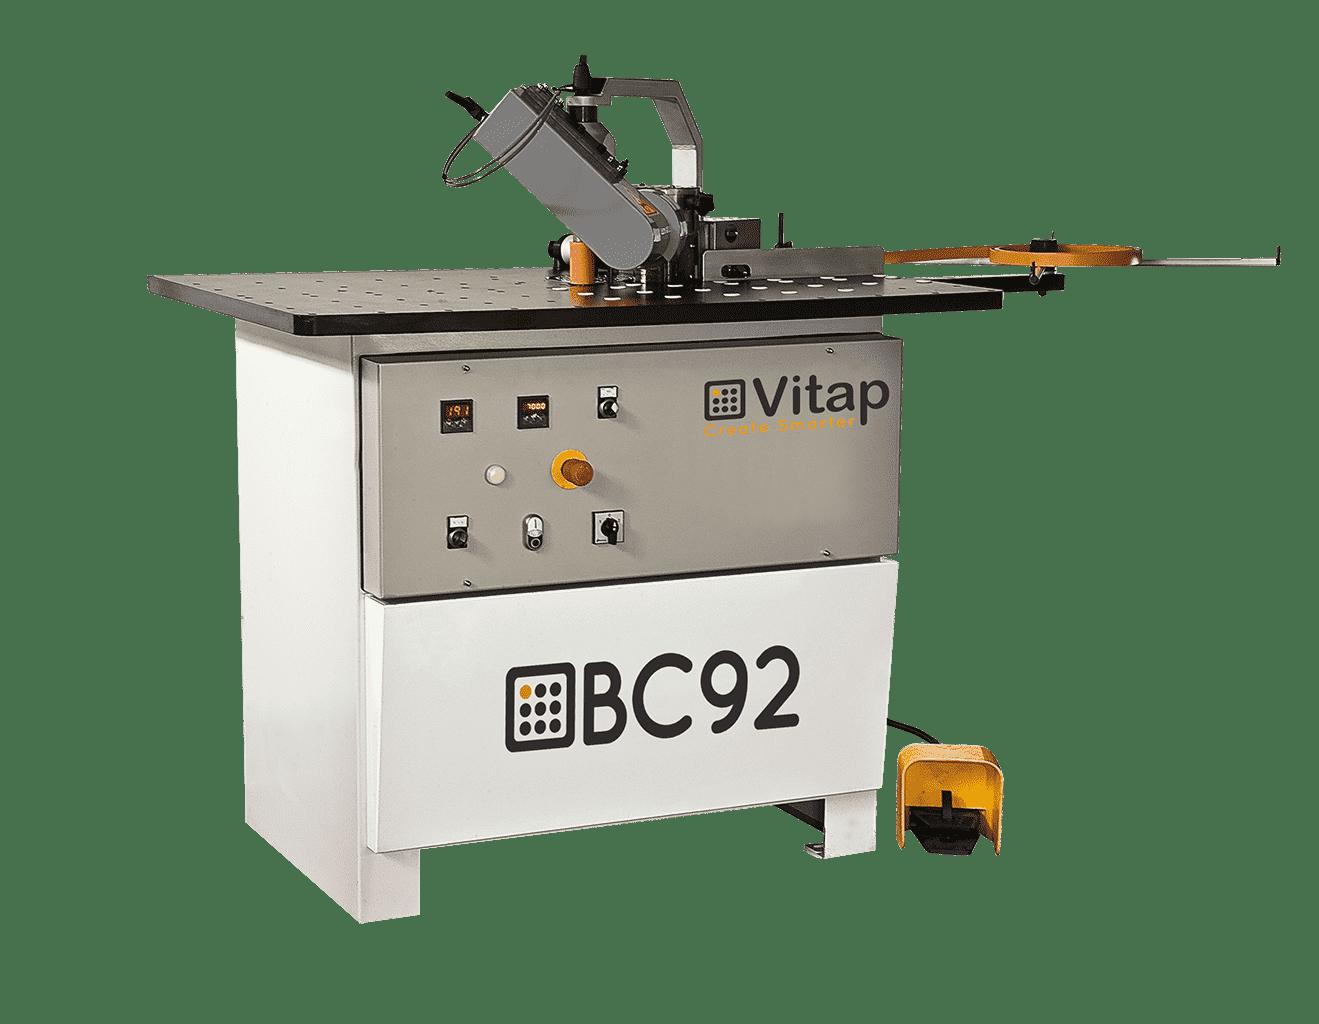 Vitap - BC92